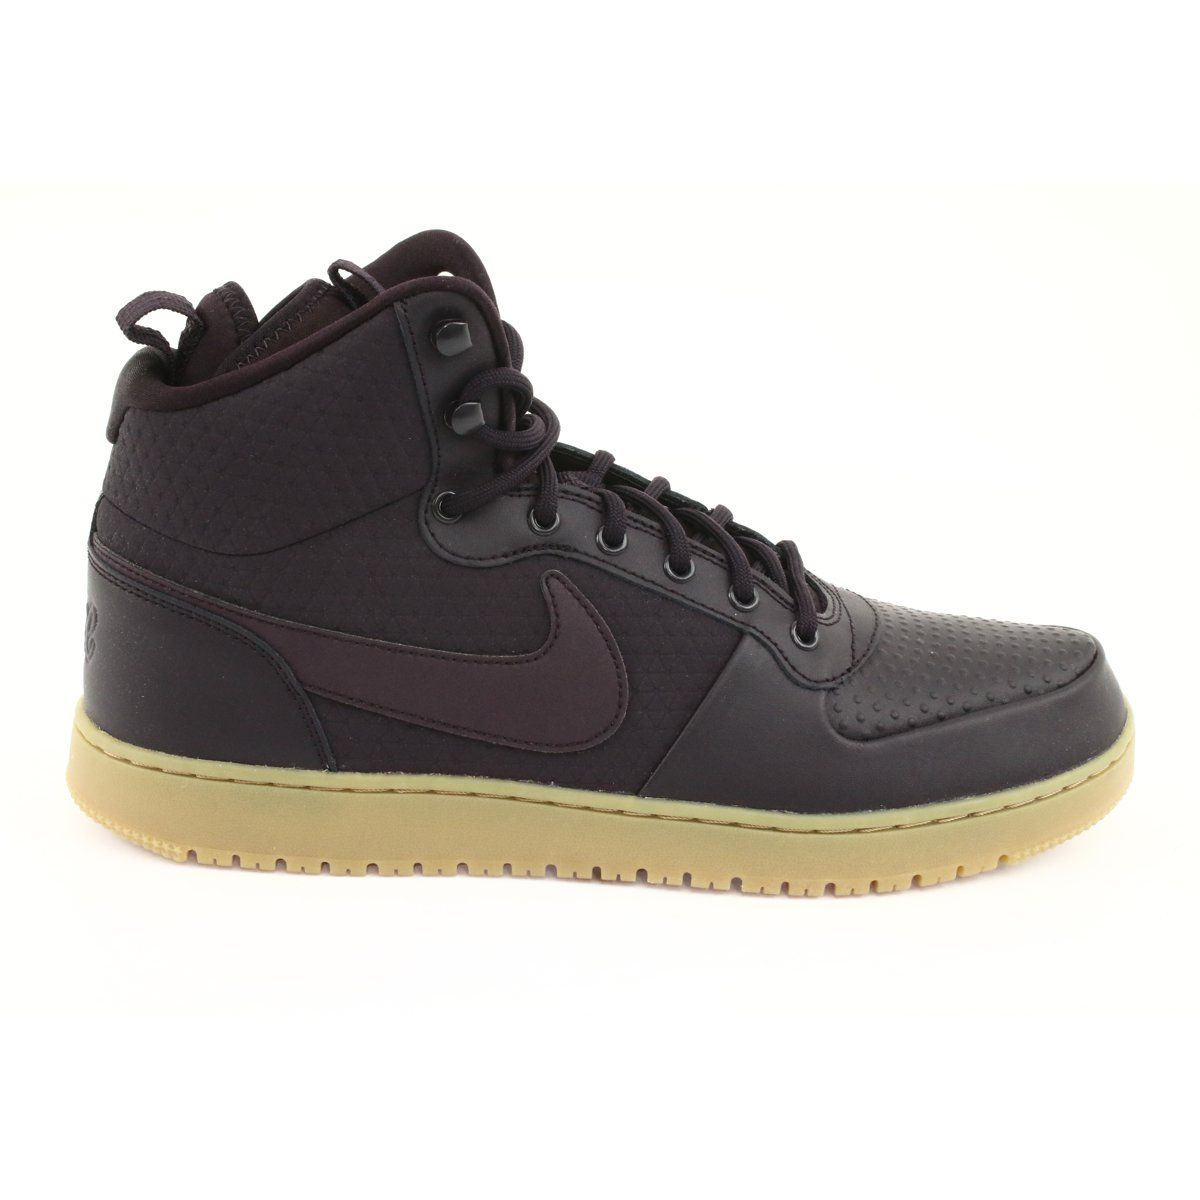 Buty Nike Ebernon Mid Winter M Aq8754 600 Wielokolorowe Nike High Top Sneakers Top Sneakers